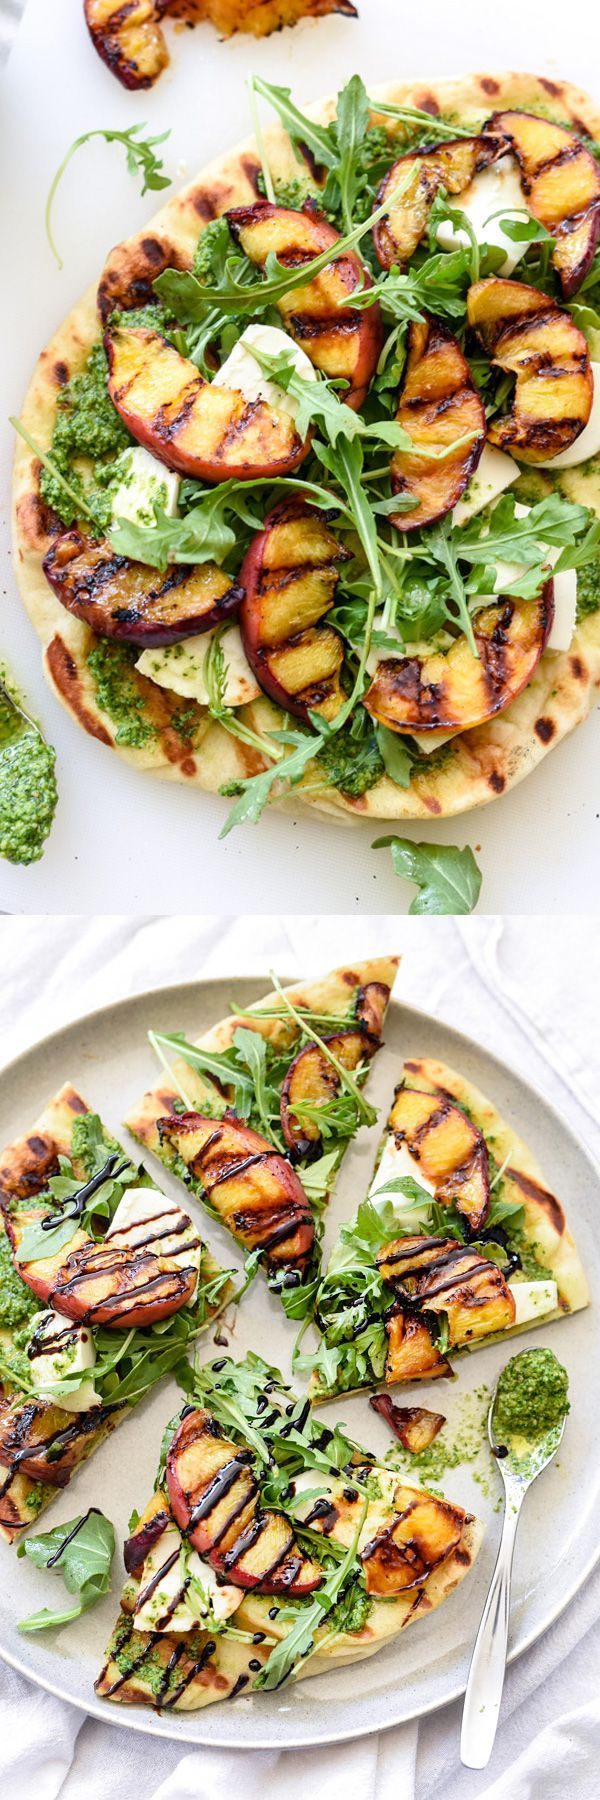 Dinner in 30 minutes! Fresh mozzarella chunks and arugula pesto give this flatbread a bit of a caprese flavor   foodiecrush.com